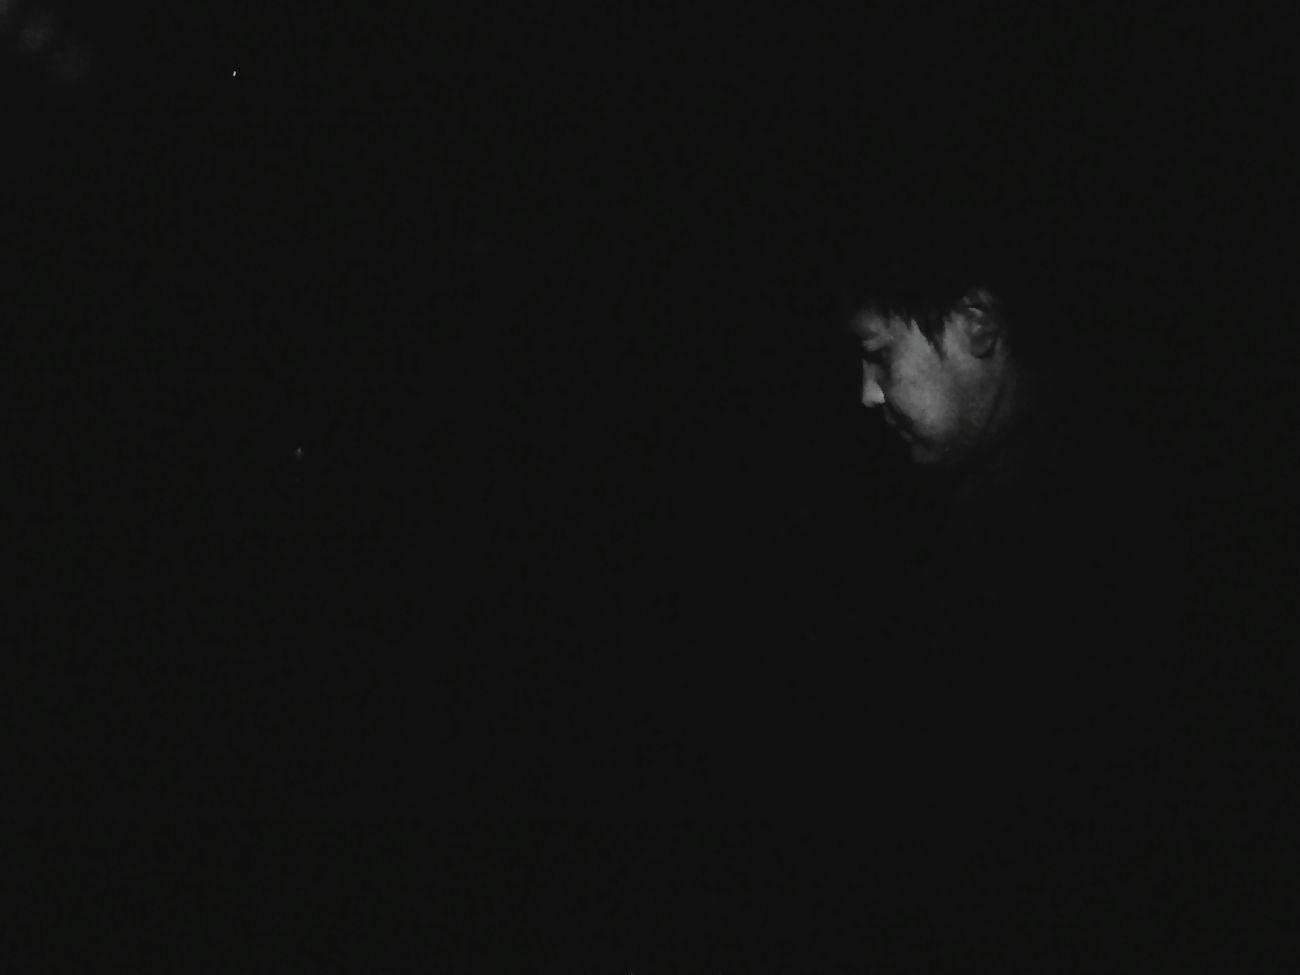 Night Vision for Night hikers 🔦🌋🌔 Photography Photographs EyeEm Team Philippines Mobilephotography POTD Eyeem Philippines EyeemPhilippines EyeemTeam Eyeemjesa Travel Hikers Rizal Mtmaynuba Mtcayabu